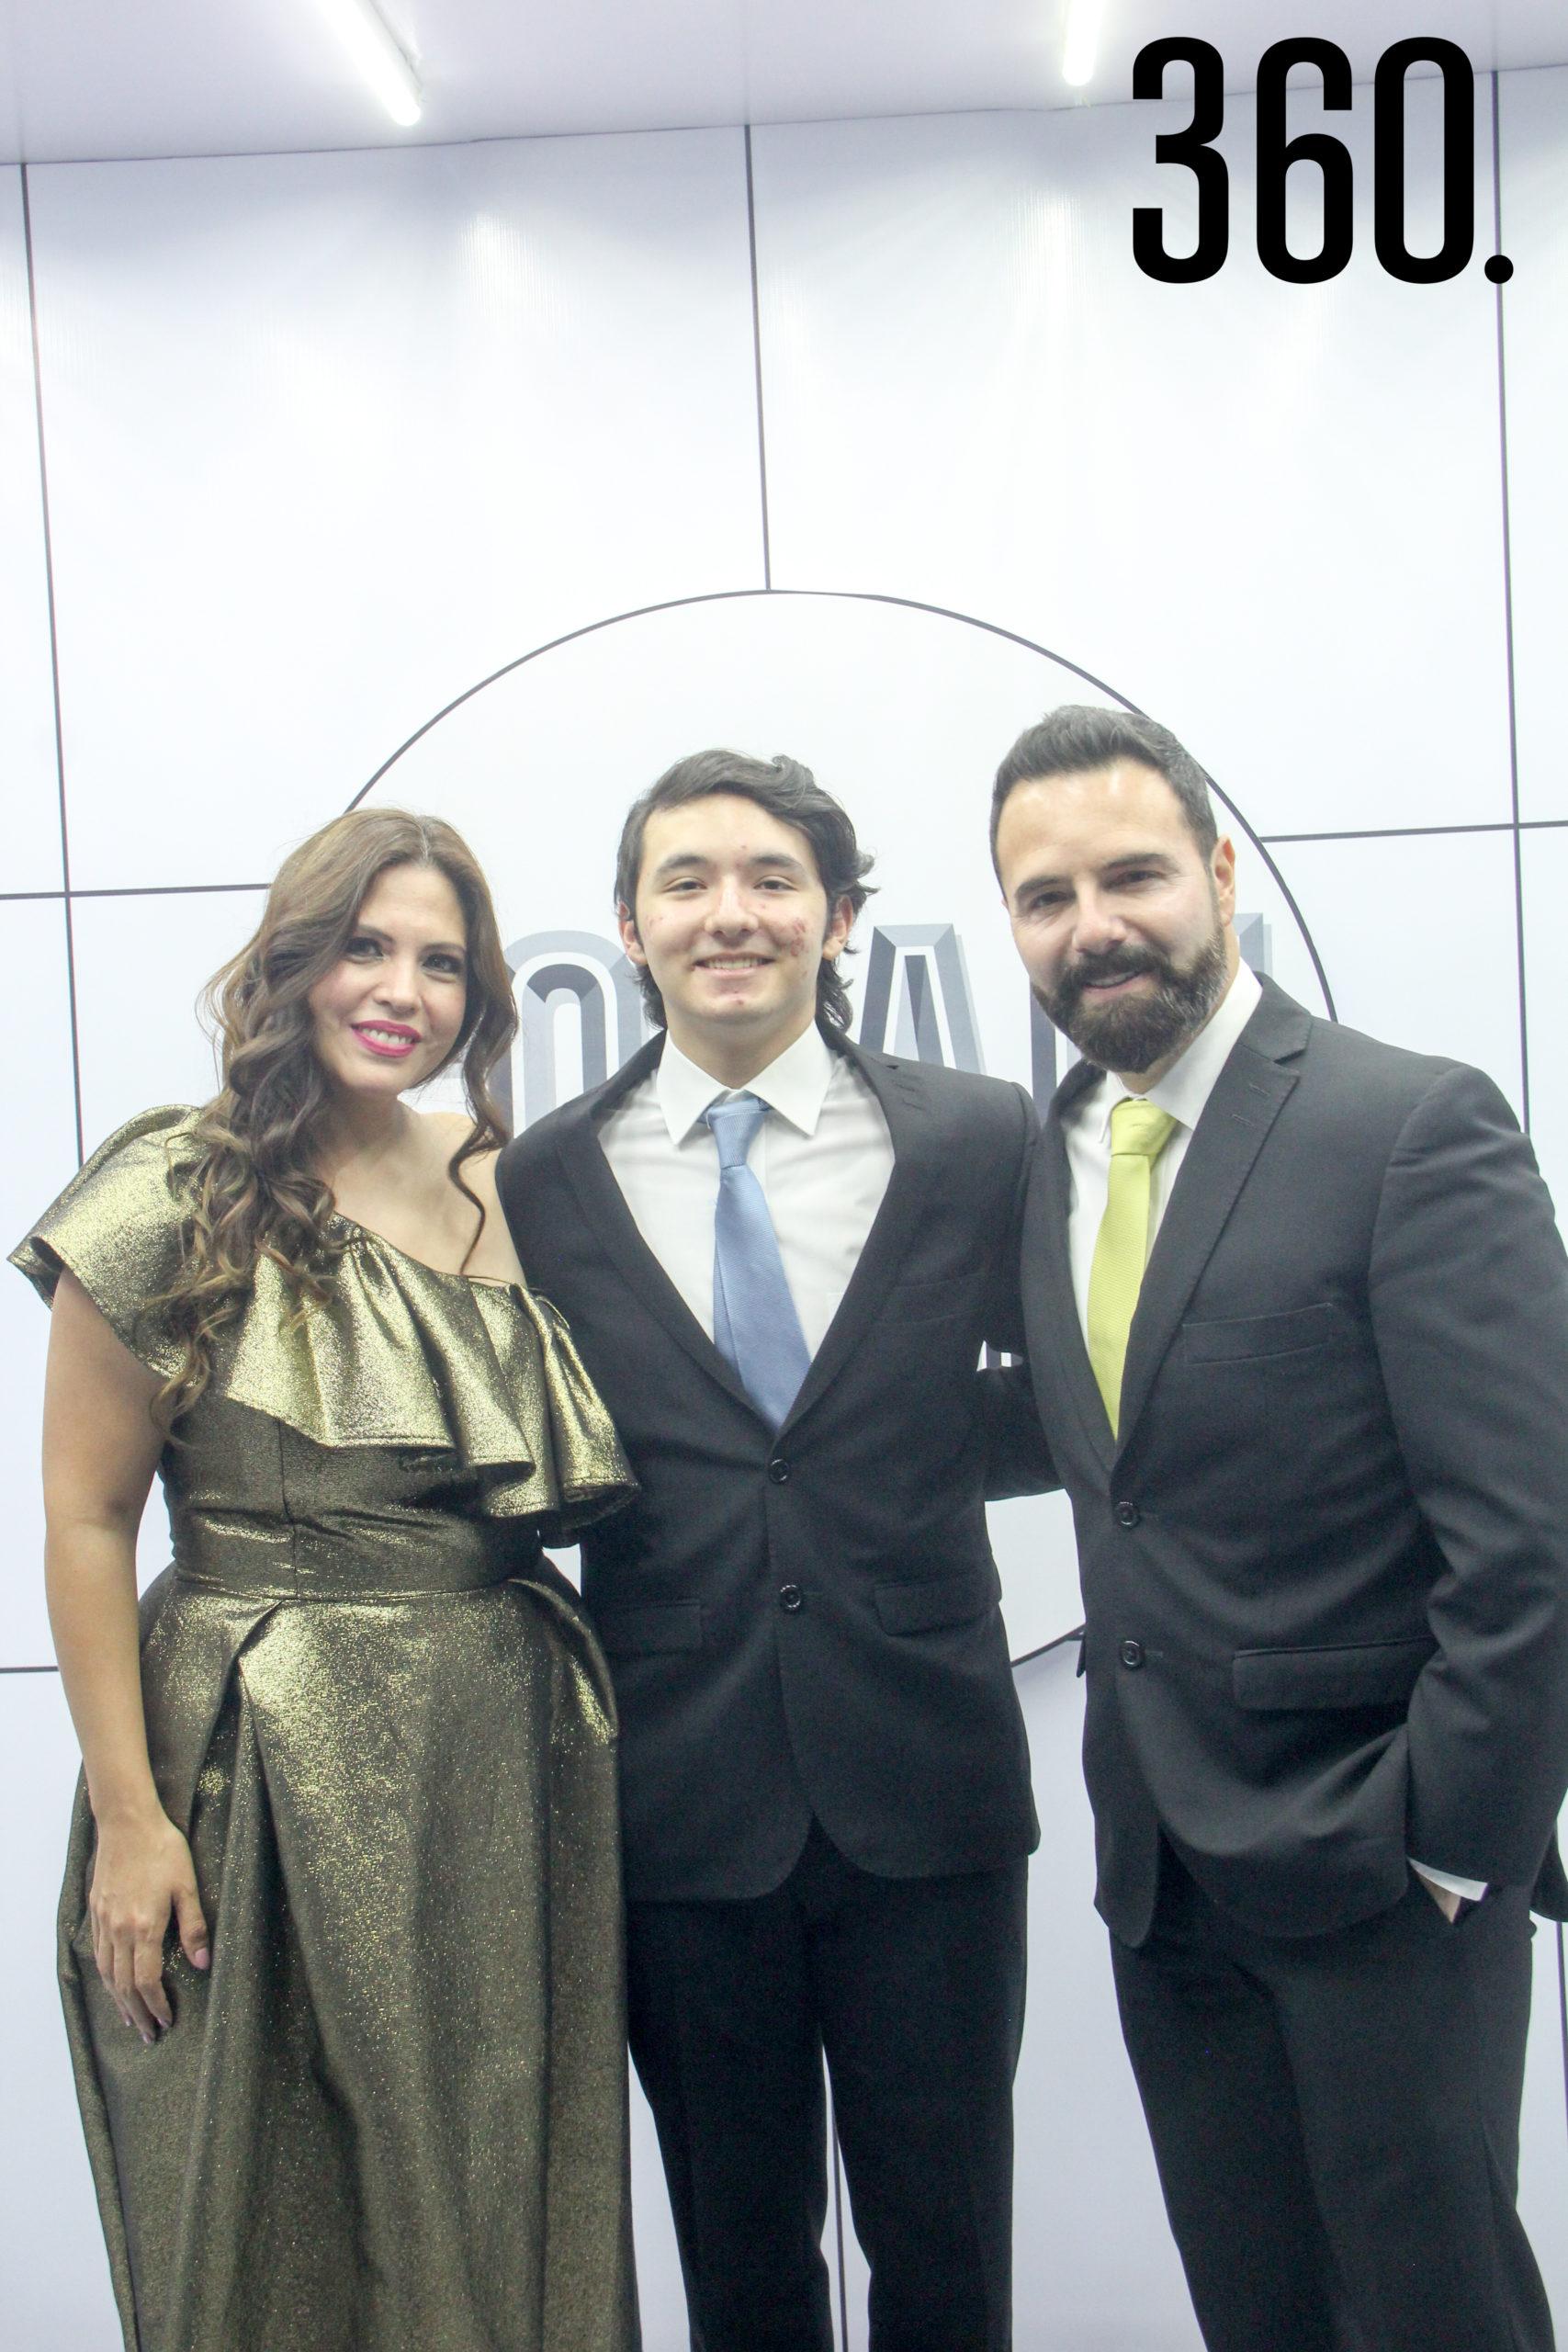 Geli de Gutiérrez, Fabrizio Gutiérrez y Alejandro Gutiérrez.